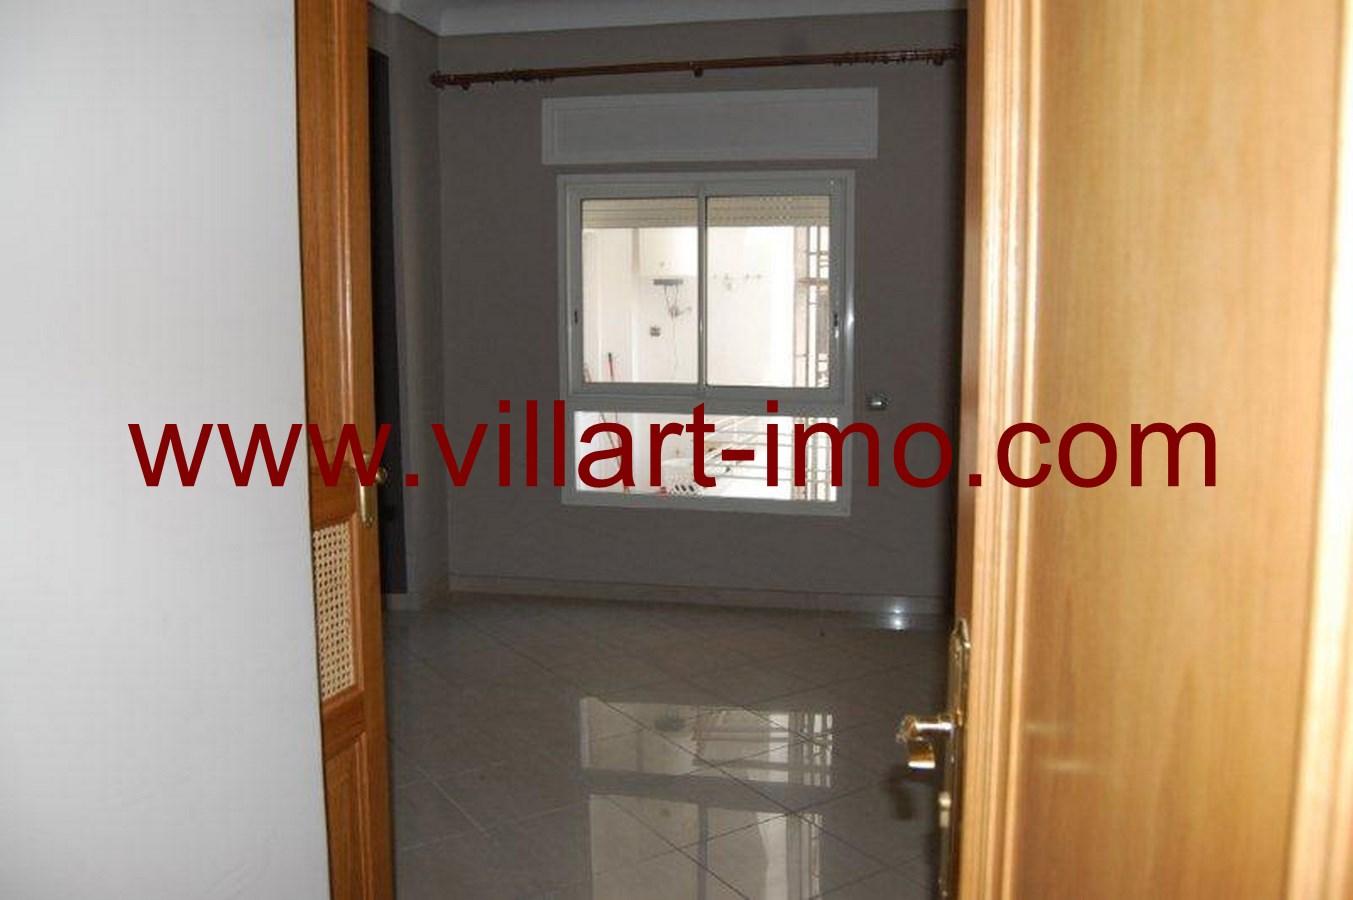 5-Location-Appartement-Non meublé-Tanger-Iberia-Chambre 1-L484-Villart immo